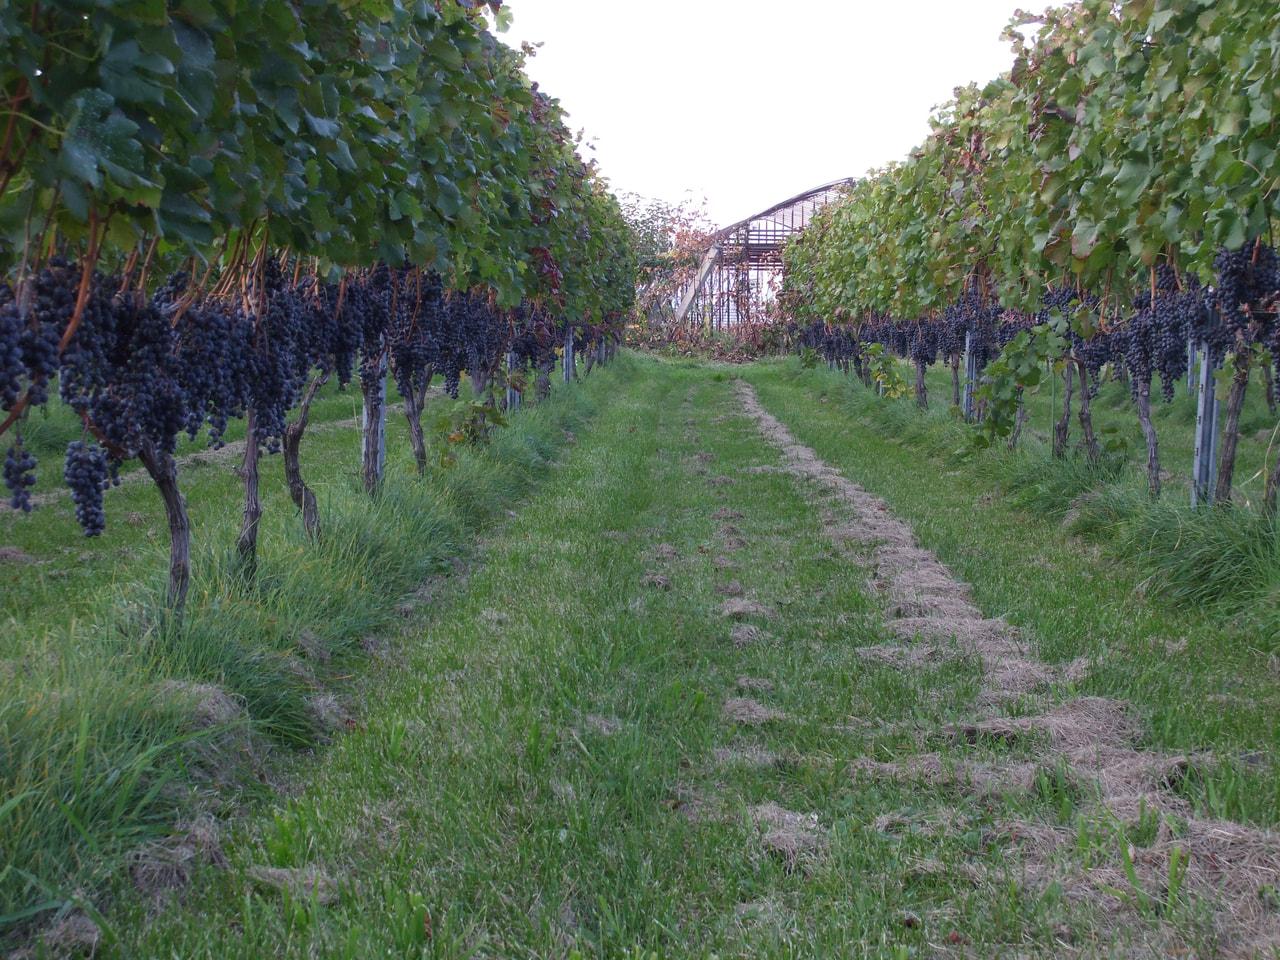 Kido Winery